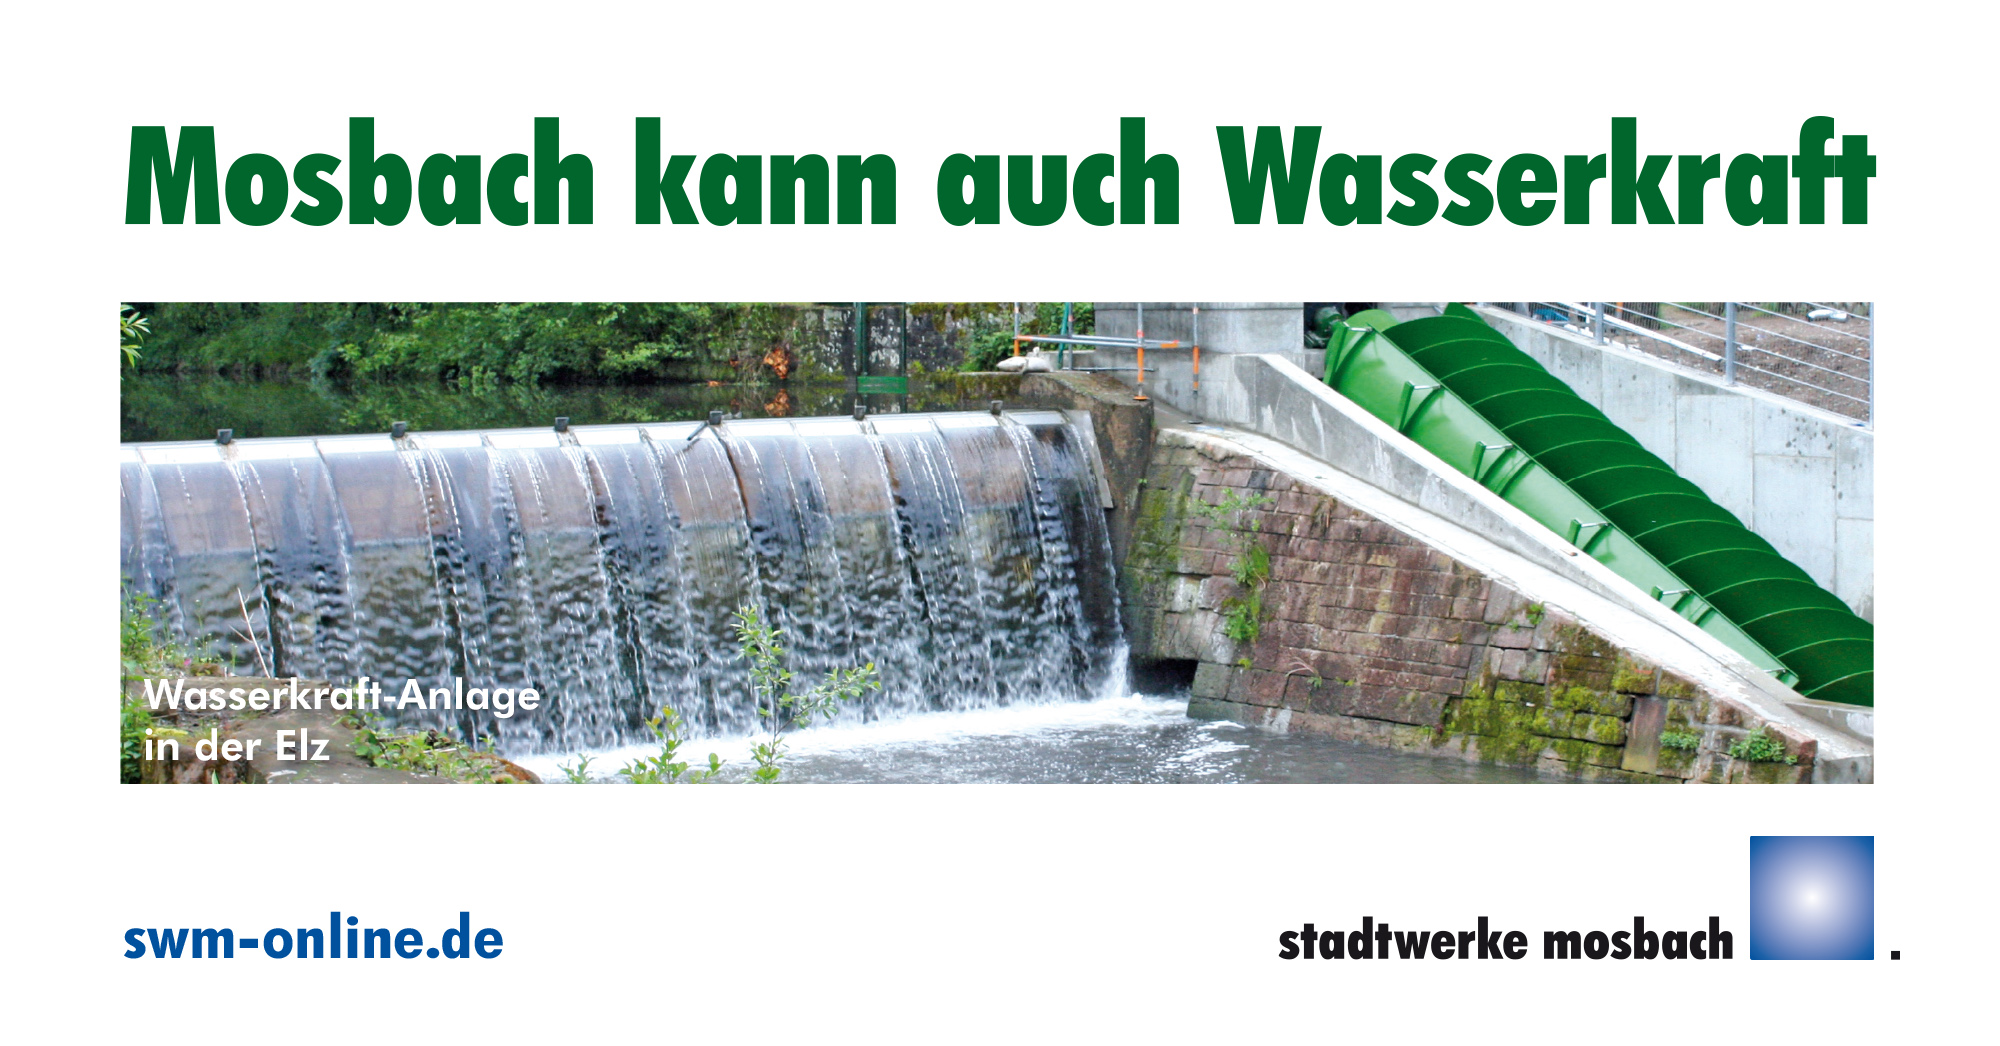 Bauzaunbanner Motiv Stadtwerke Mosbach Wasserkraft